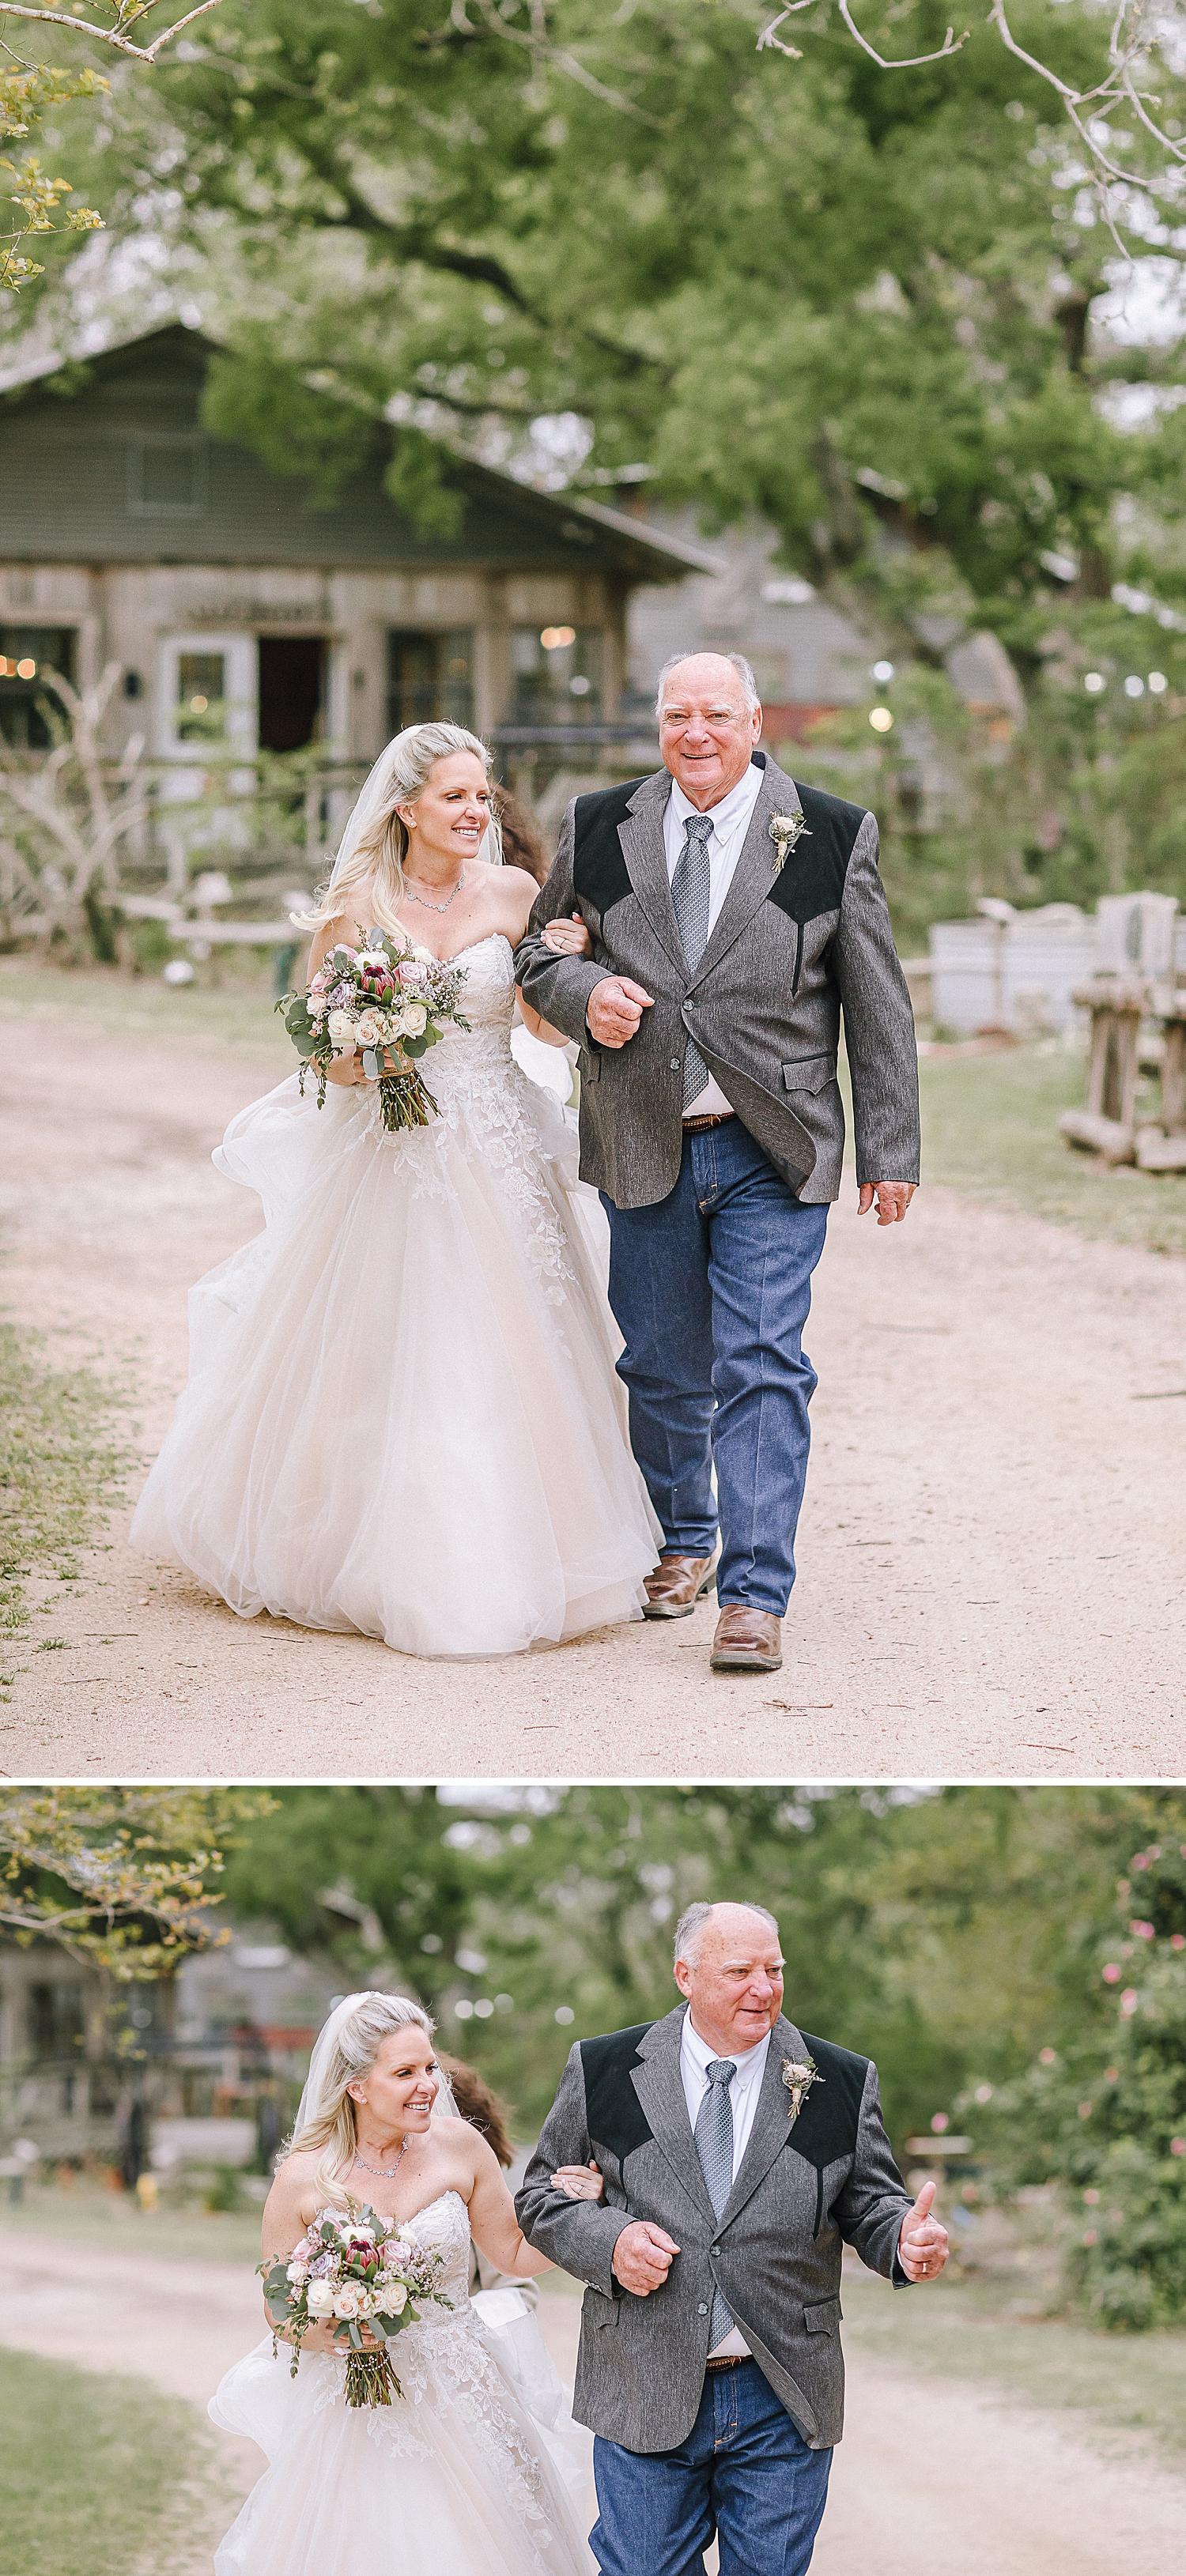 Rio-Cibilo-Ranch-Marion-Texas-Wedding-Rustic-Blush-Rose-Quartz-Details-Carly-Barton-Photography_0043.jpg